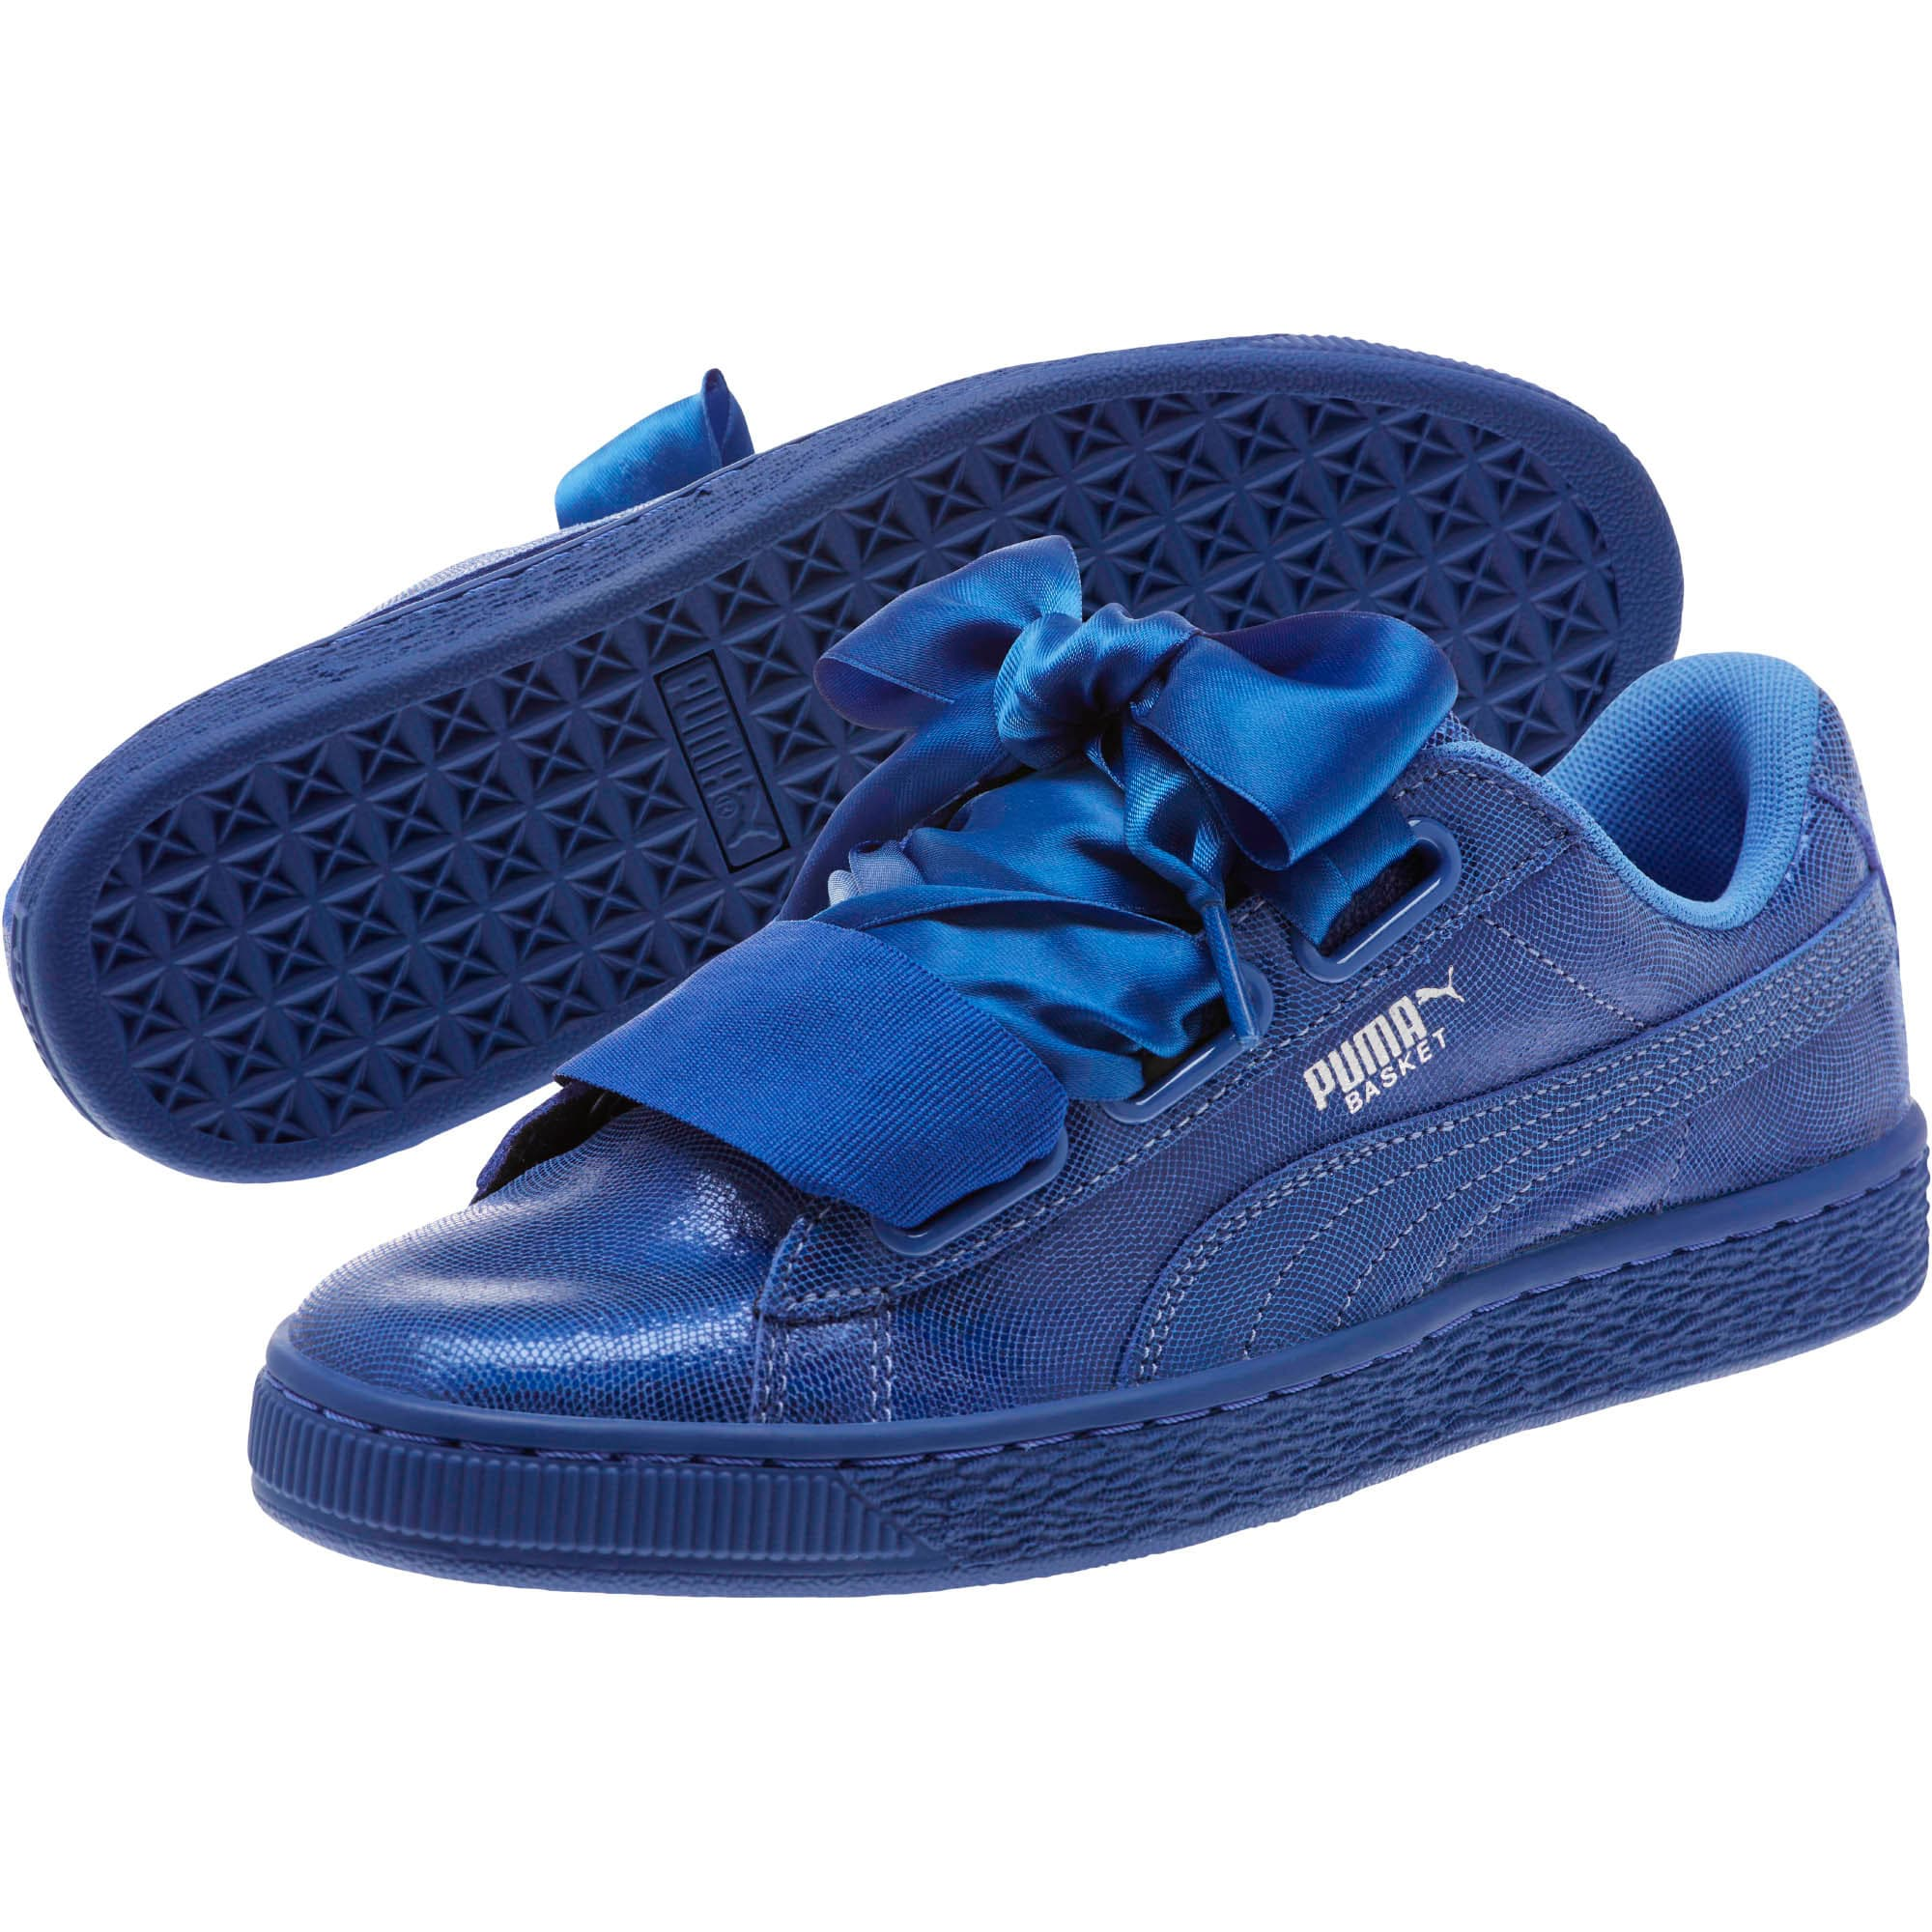 Thumbnail 2 of Basket Heart Opulence Women's Sneakers, Baja Blue-Baja Blue, medium